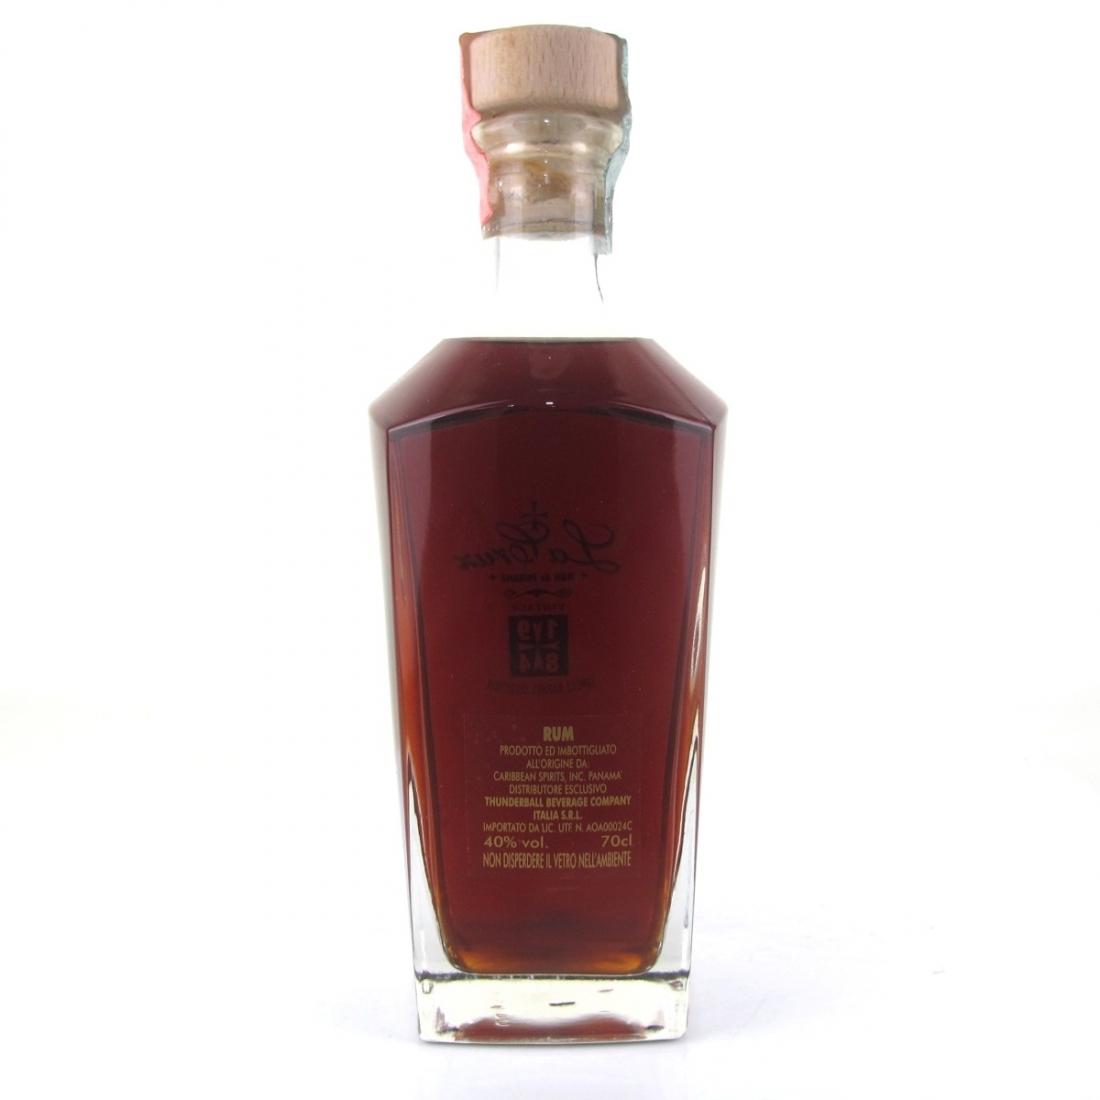 La Cruz 1984 Ron de Panama Single Barrel Rum